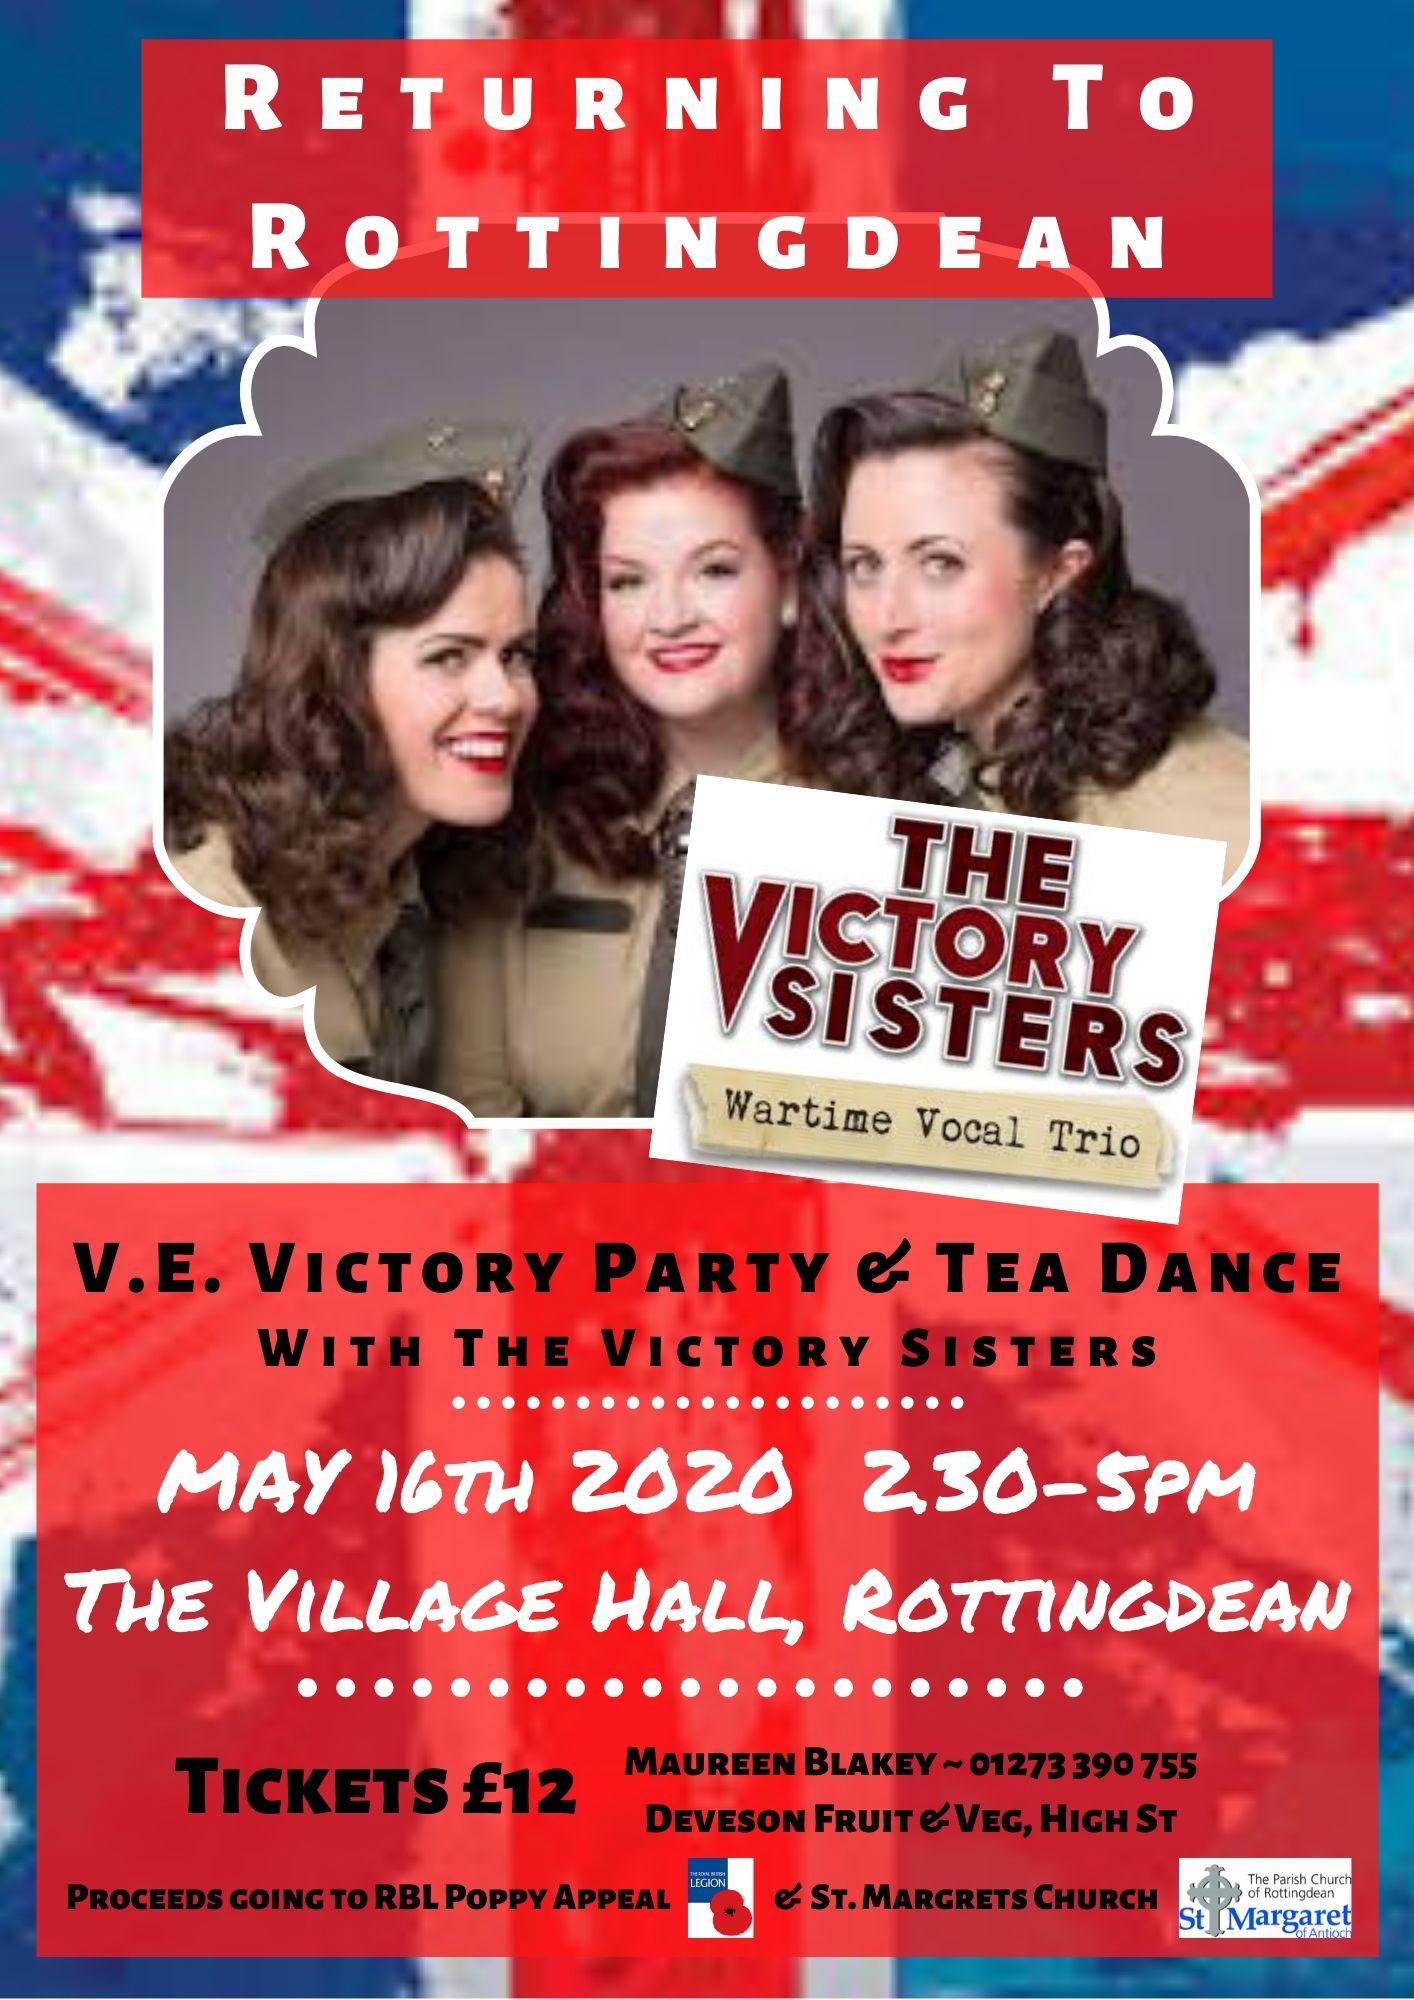 Rottingdean Tea Dance Poster